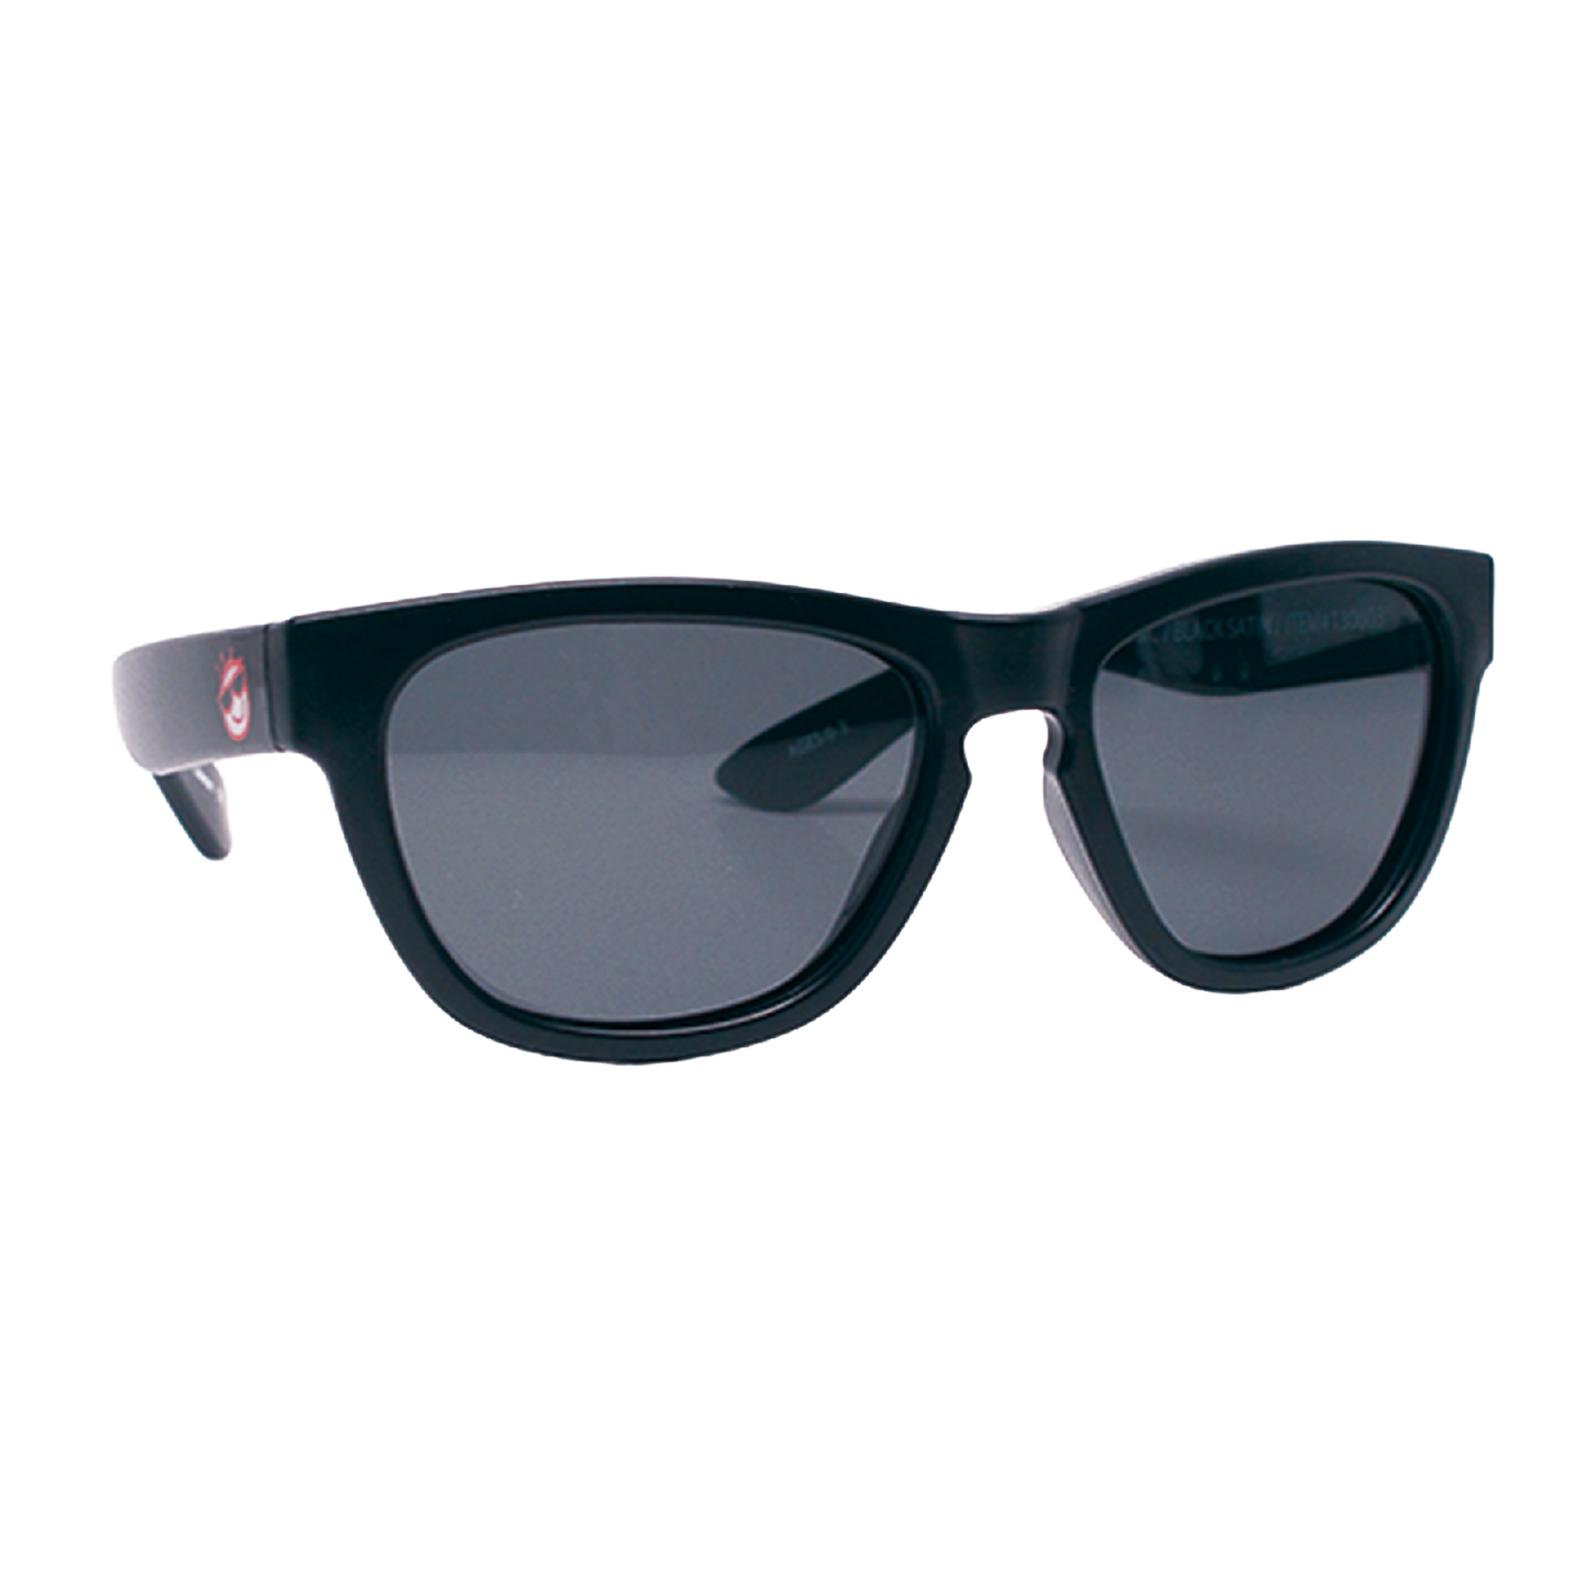 K's Reflekt Polarized Classic Mini Shades, 0-3-4